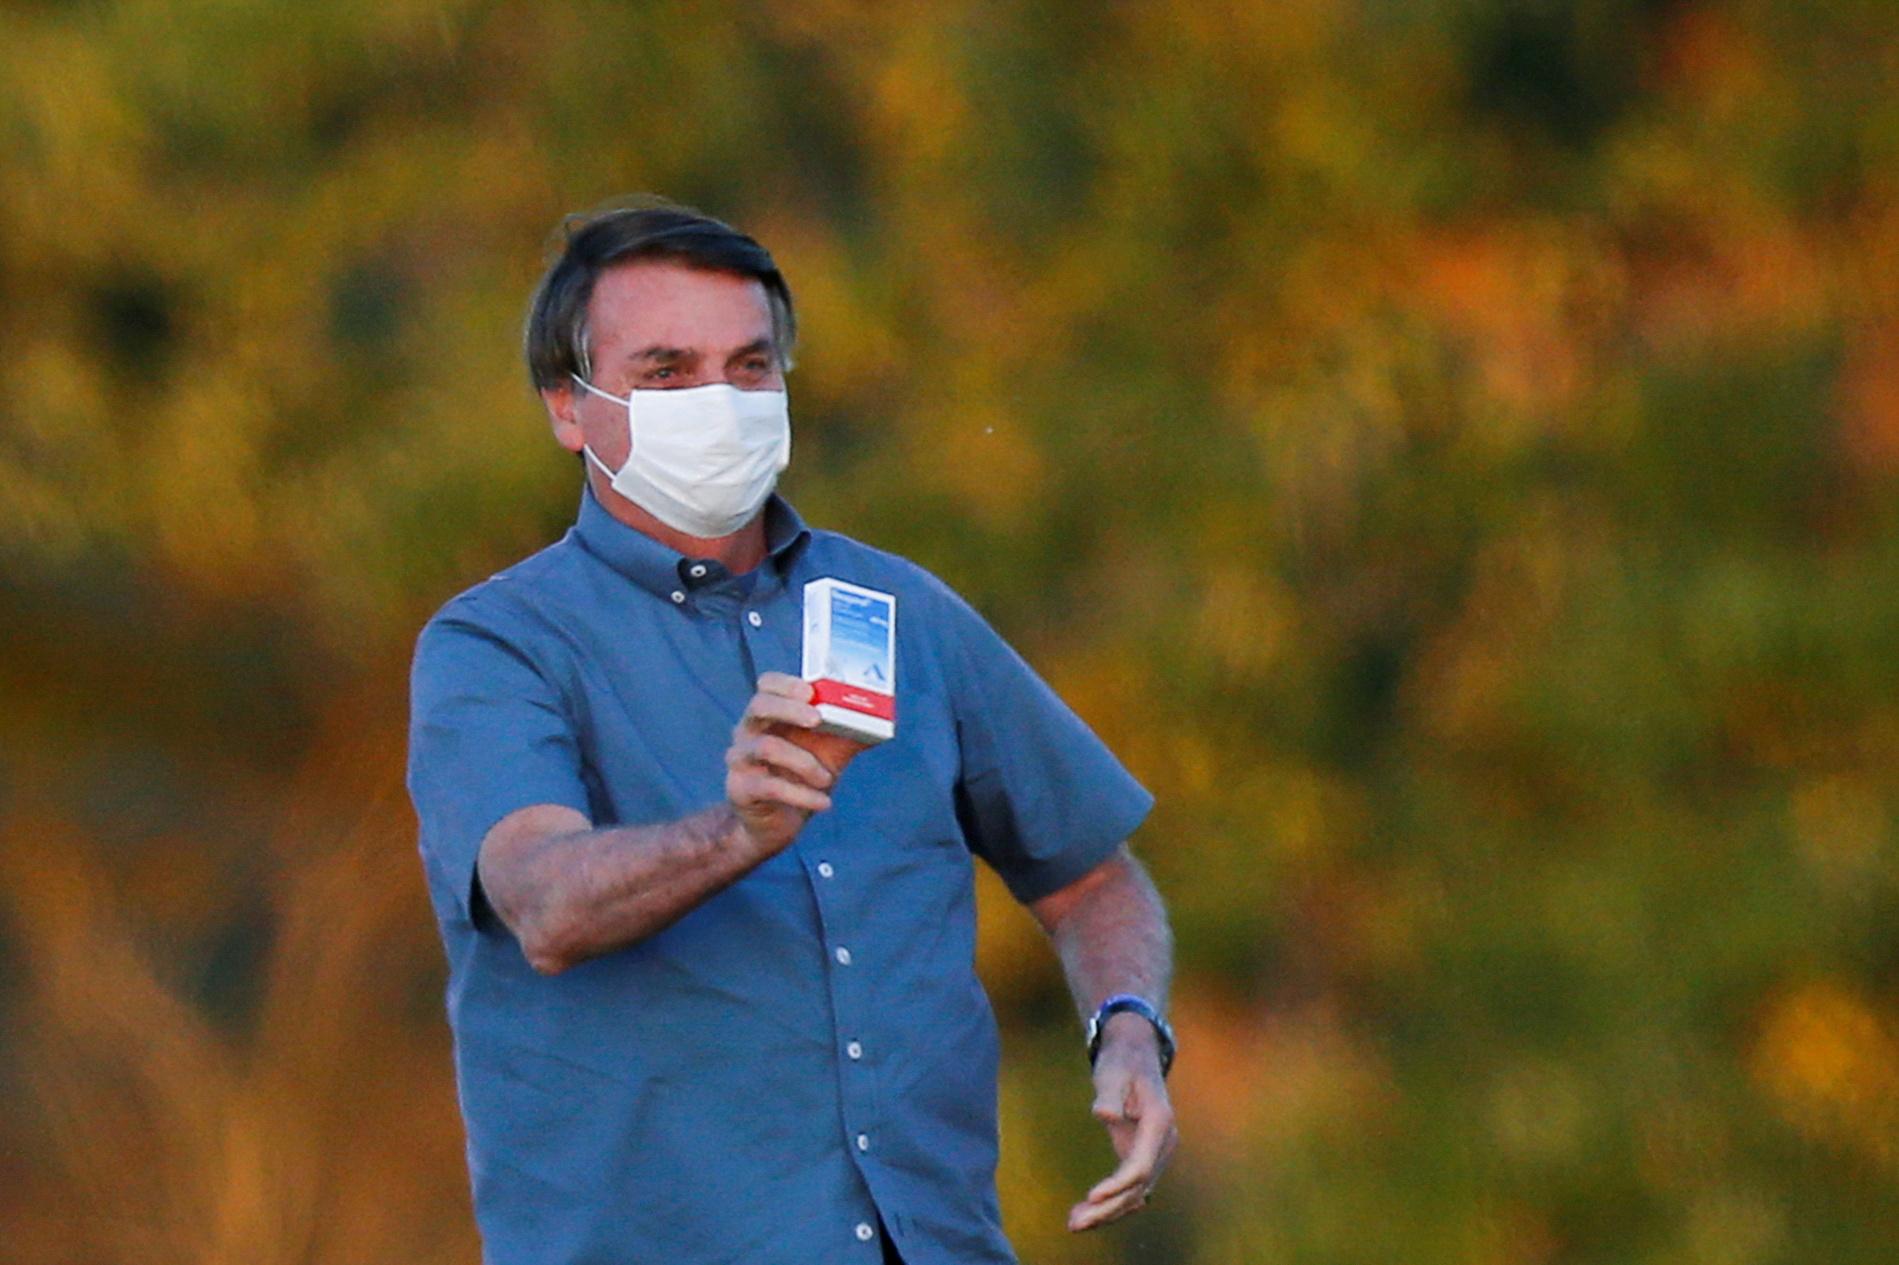 Brazil's President Jair Bolsonaro holds a box of chloroquine outside of the Alvorada Palace, amid the coronavirus disease (COVID-19) outbreak in Brasilia, Brazil, July 23, 2020.REUTERS/Adriano Machado/File photo